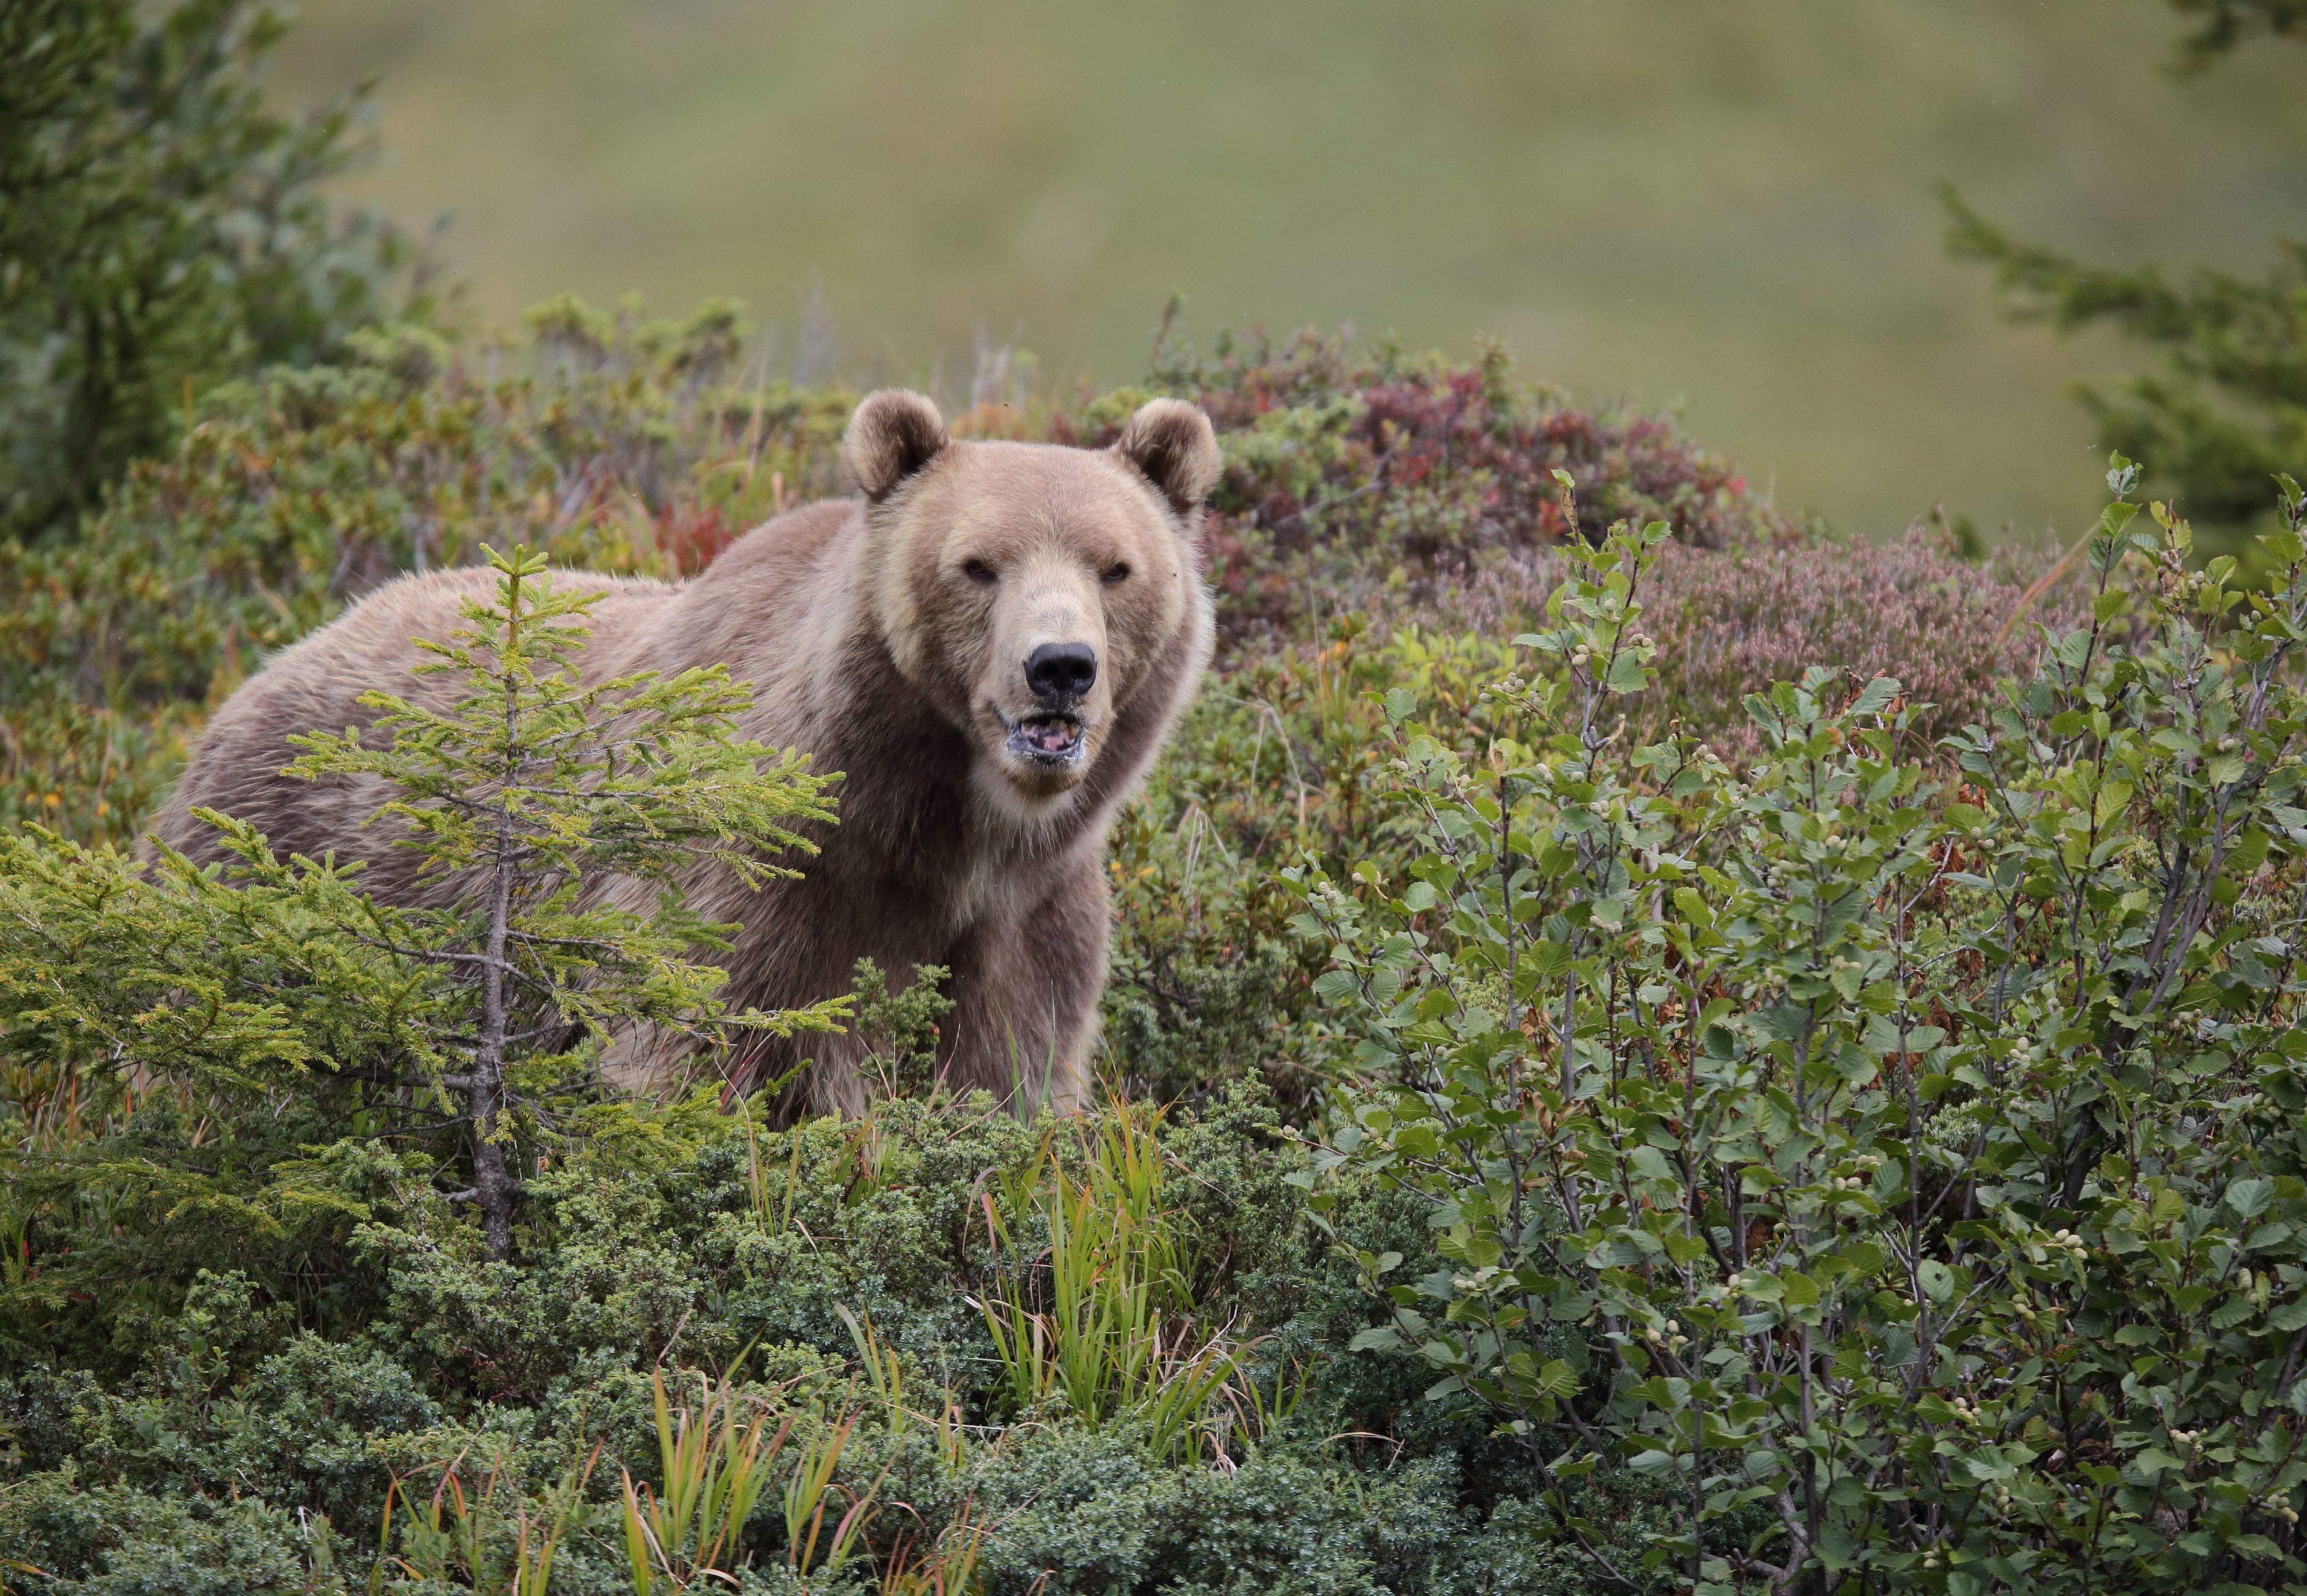 Arosa Bear Sanctuary